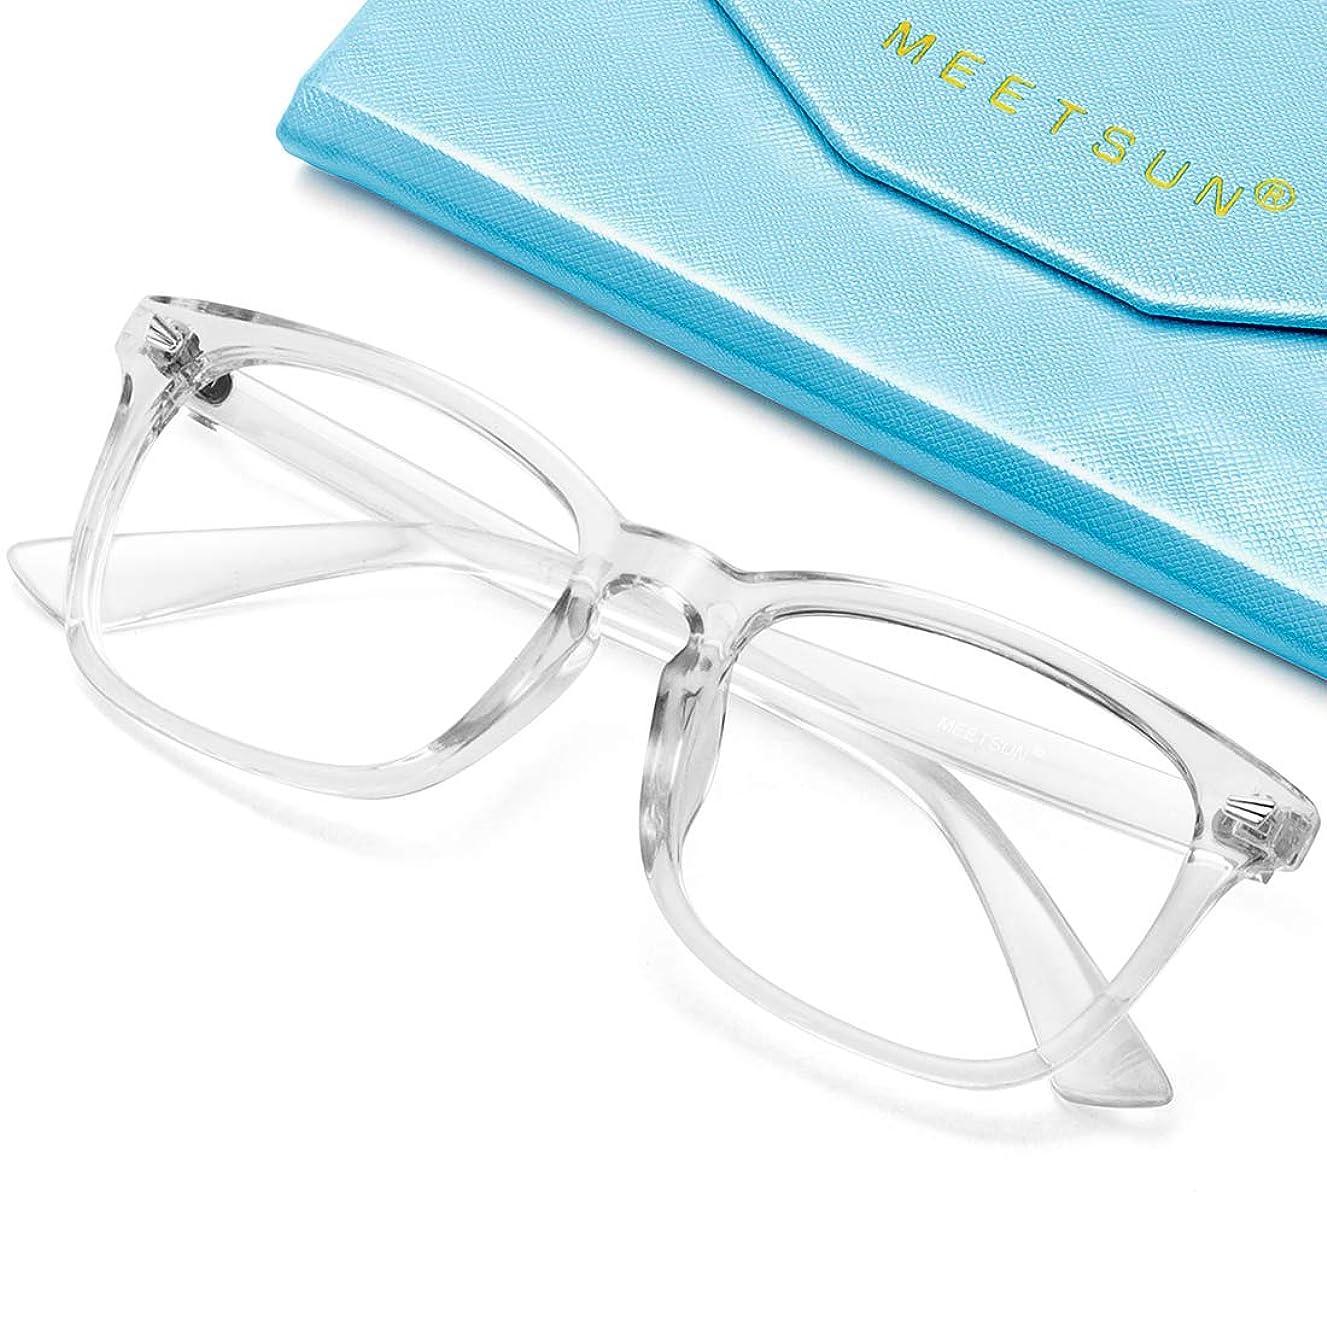 MEETSUN Blue Light Blocking Computer Glasses,Anti Eyestrain & Reduce Headache, Anti Glare Lens